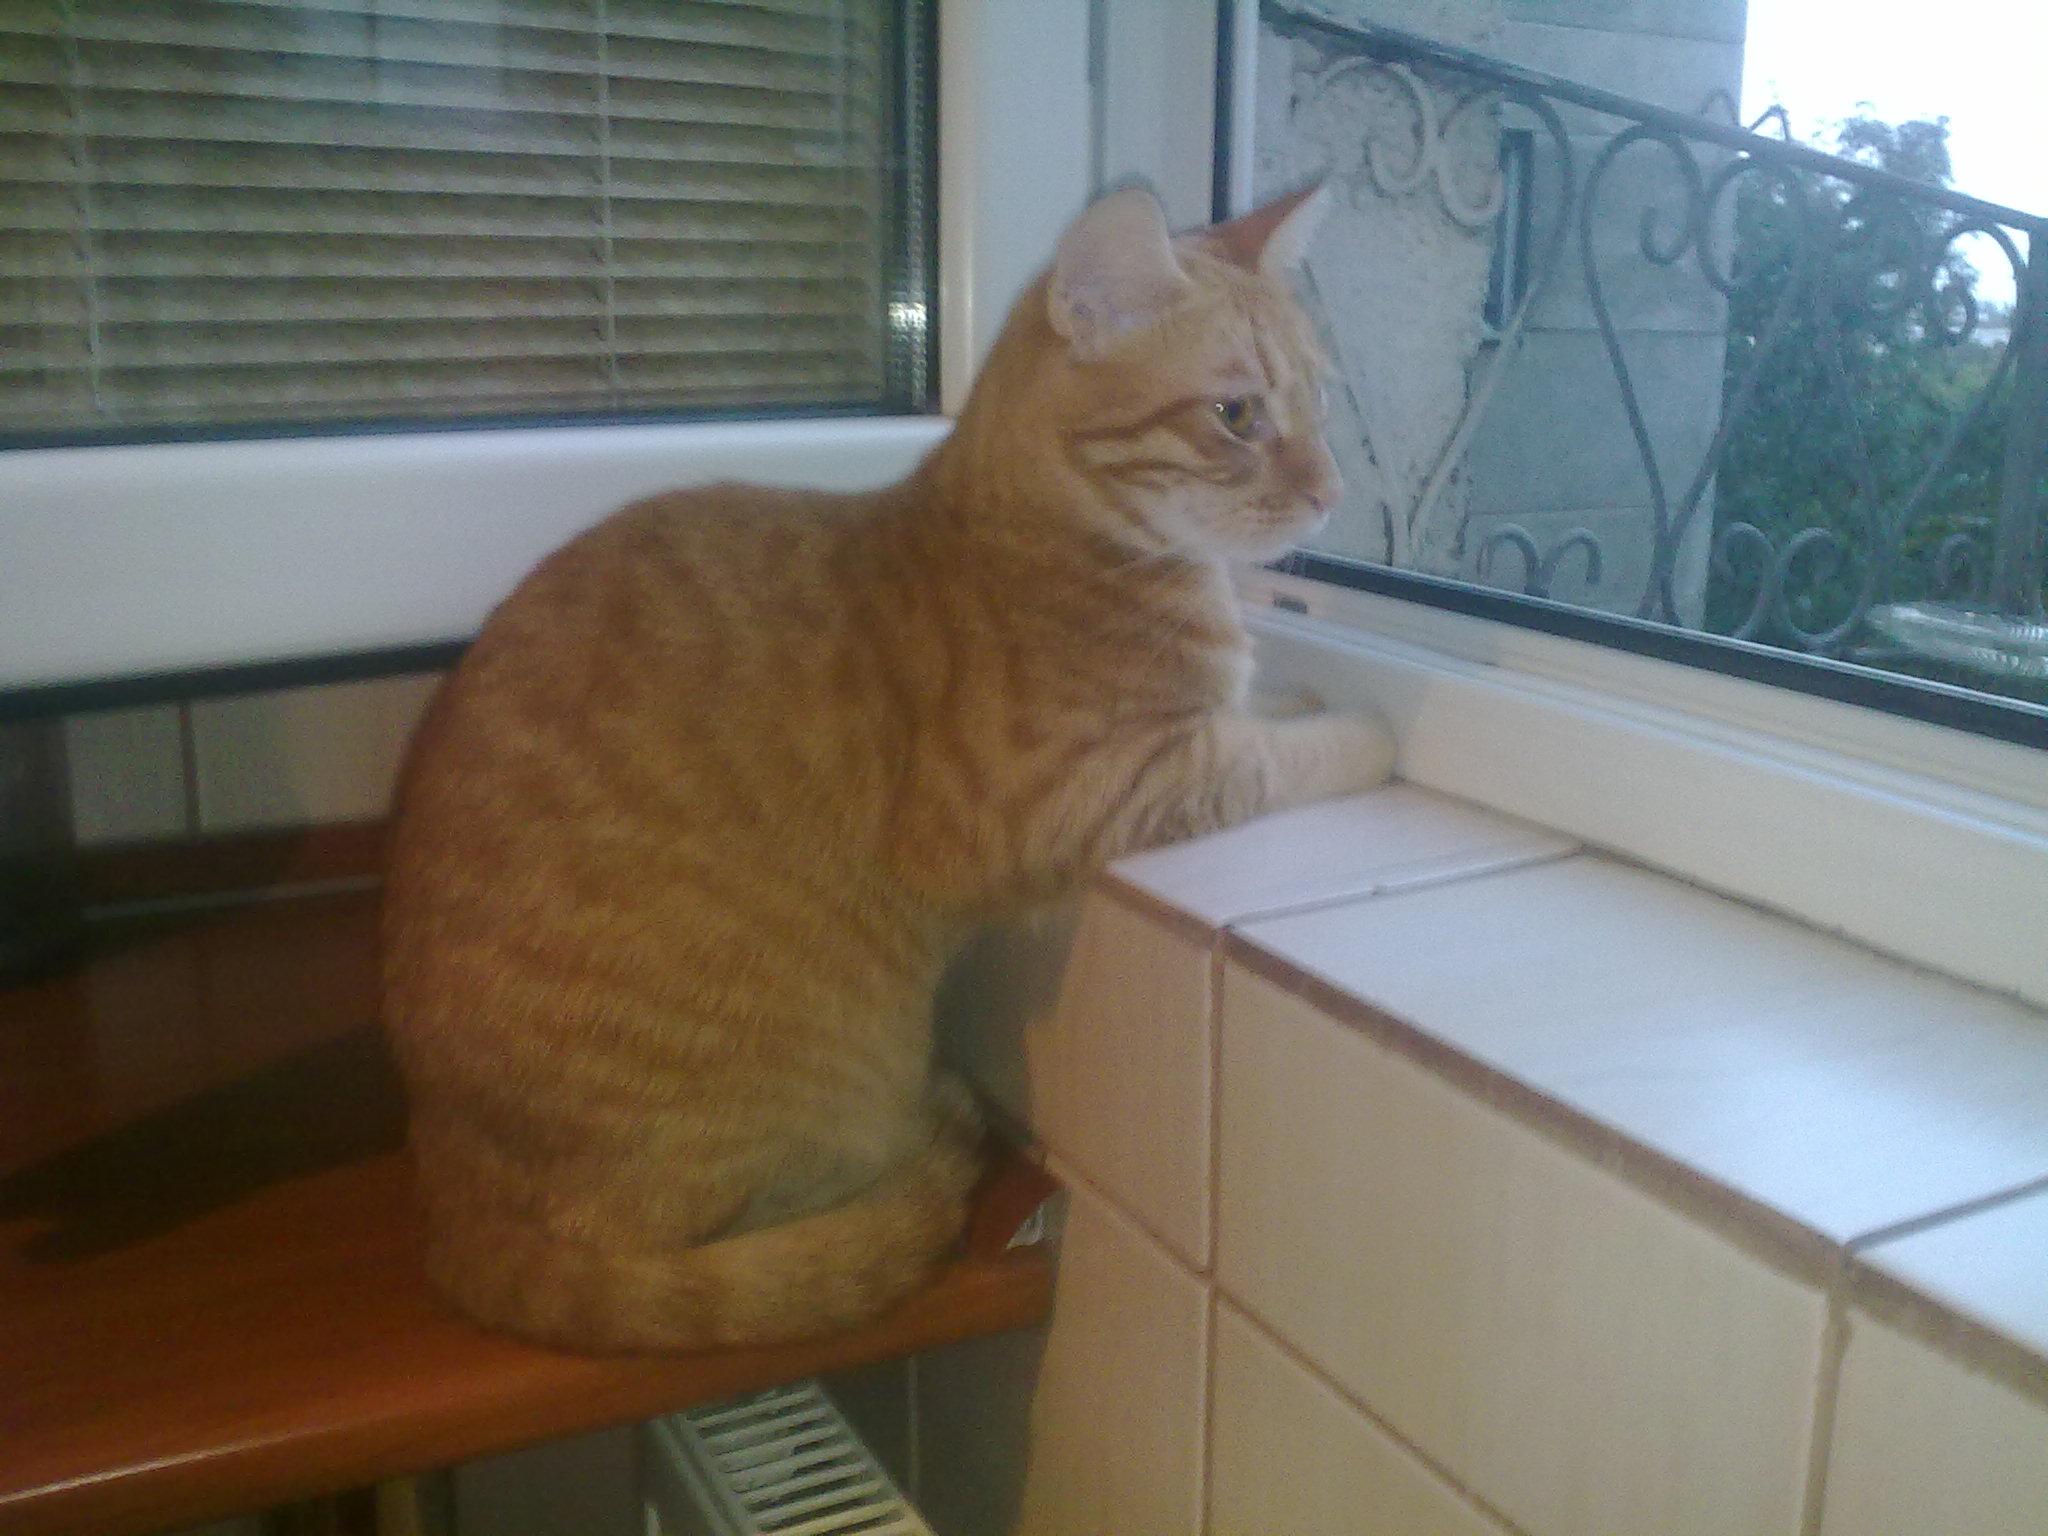 Kitty are nevoie de un nou stapan. Este foarte jucausa si prietenoasa